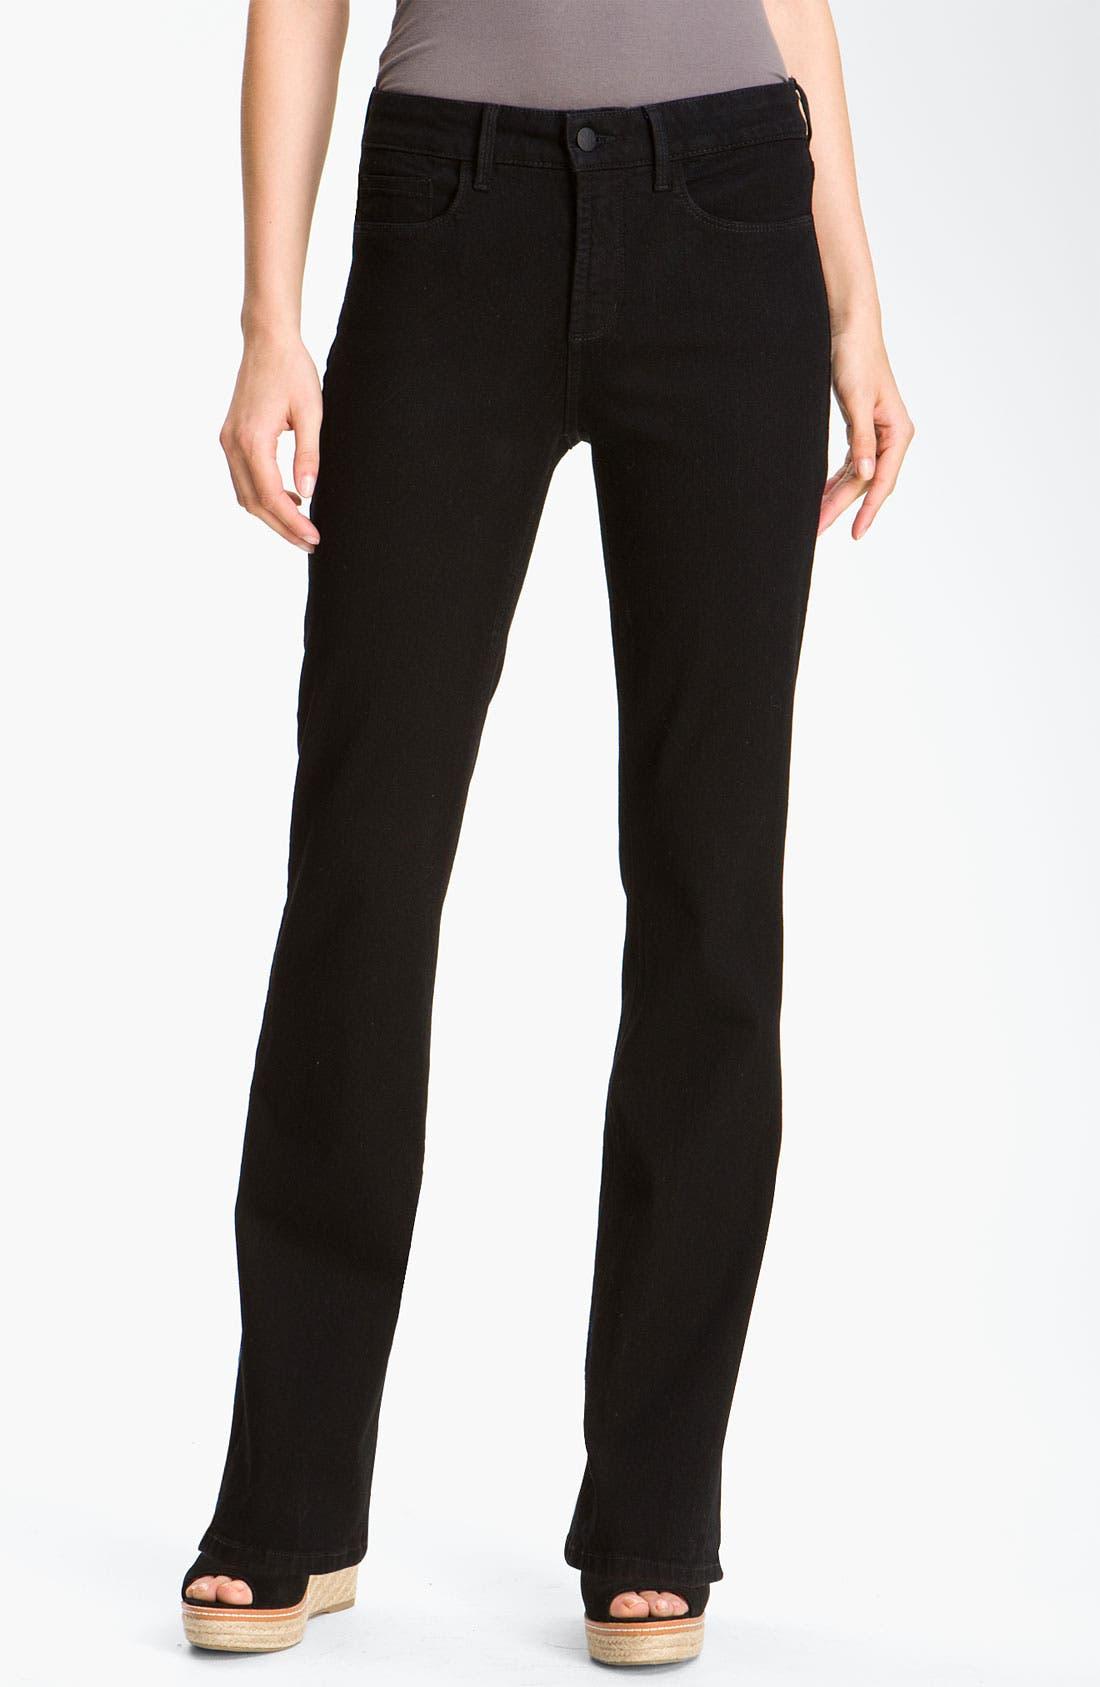 Alternate Image 1 Selected - NYDJ 'Barbara' Embellished Bootcut Jeans (Petite)